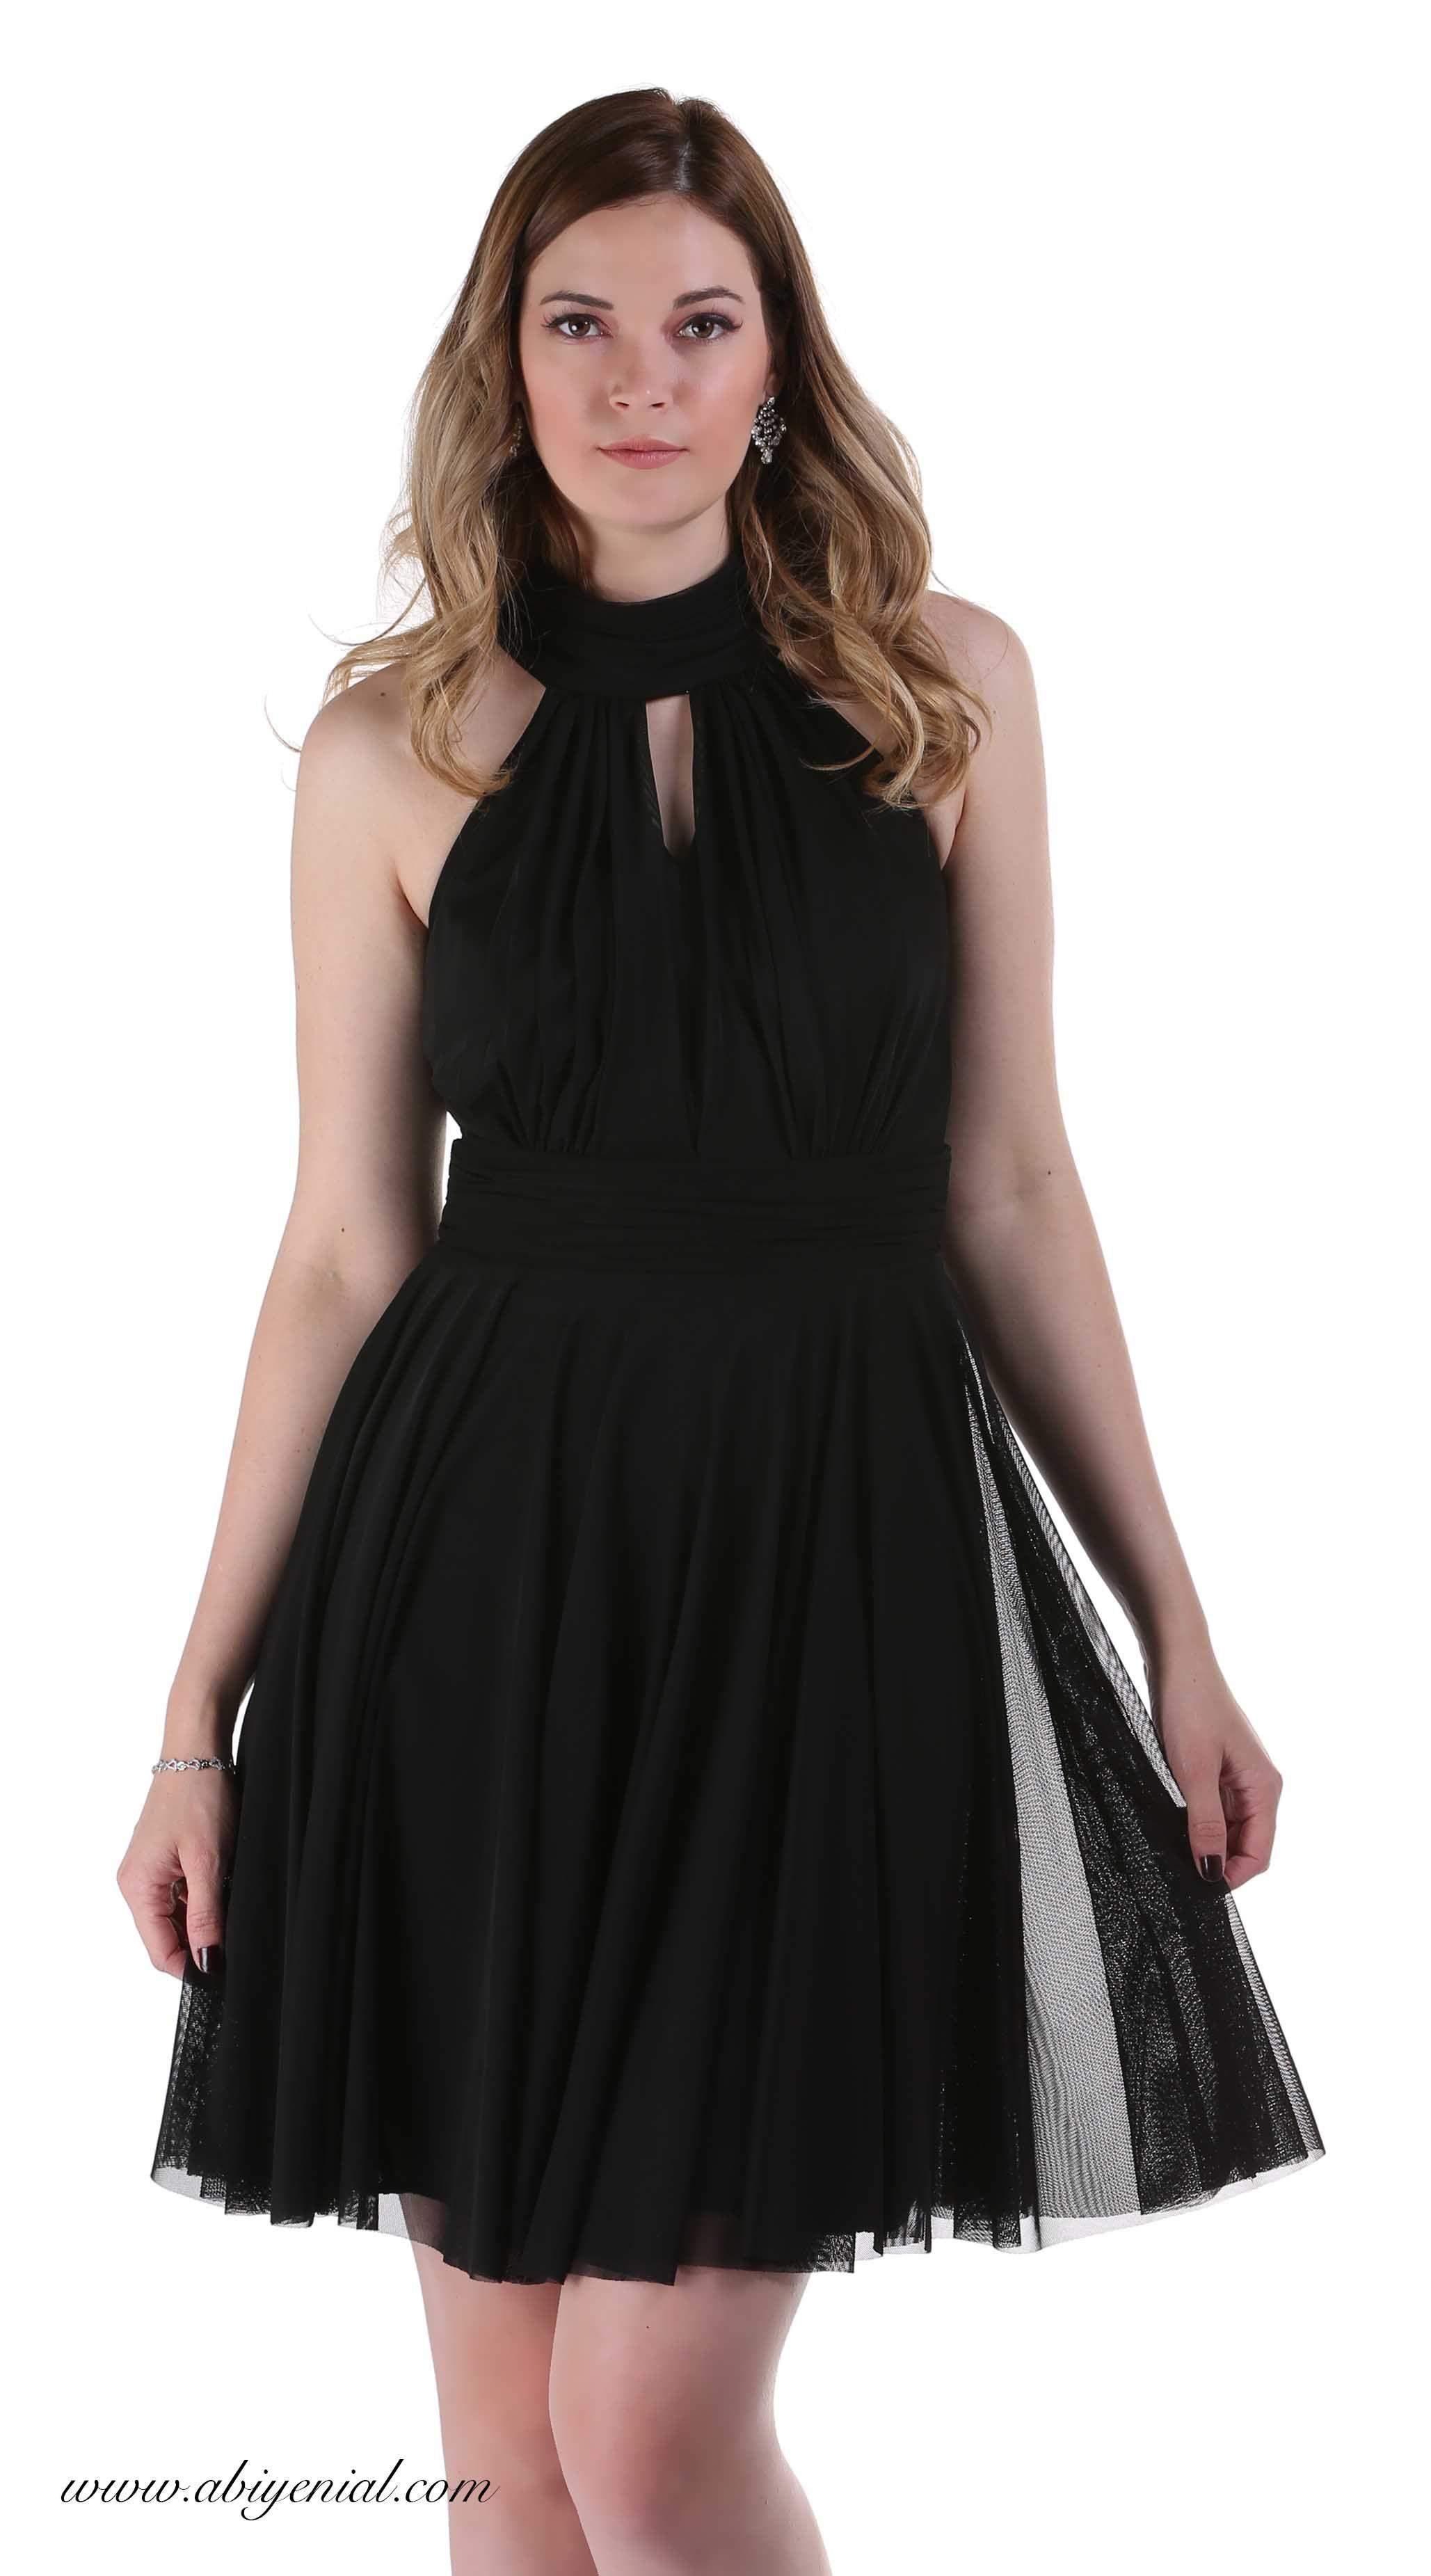 Siyah Kisa Tul Abiye Elbise Stefanel Yaka Tul Siyah Stefanelyaka Sade Kisa Abiye Sozelbisesi Black Dresses Elbise Mini Elbiseler Siyah Kisa Elbise